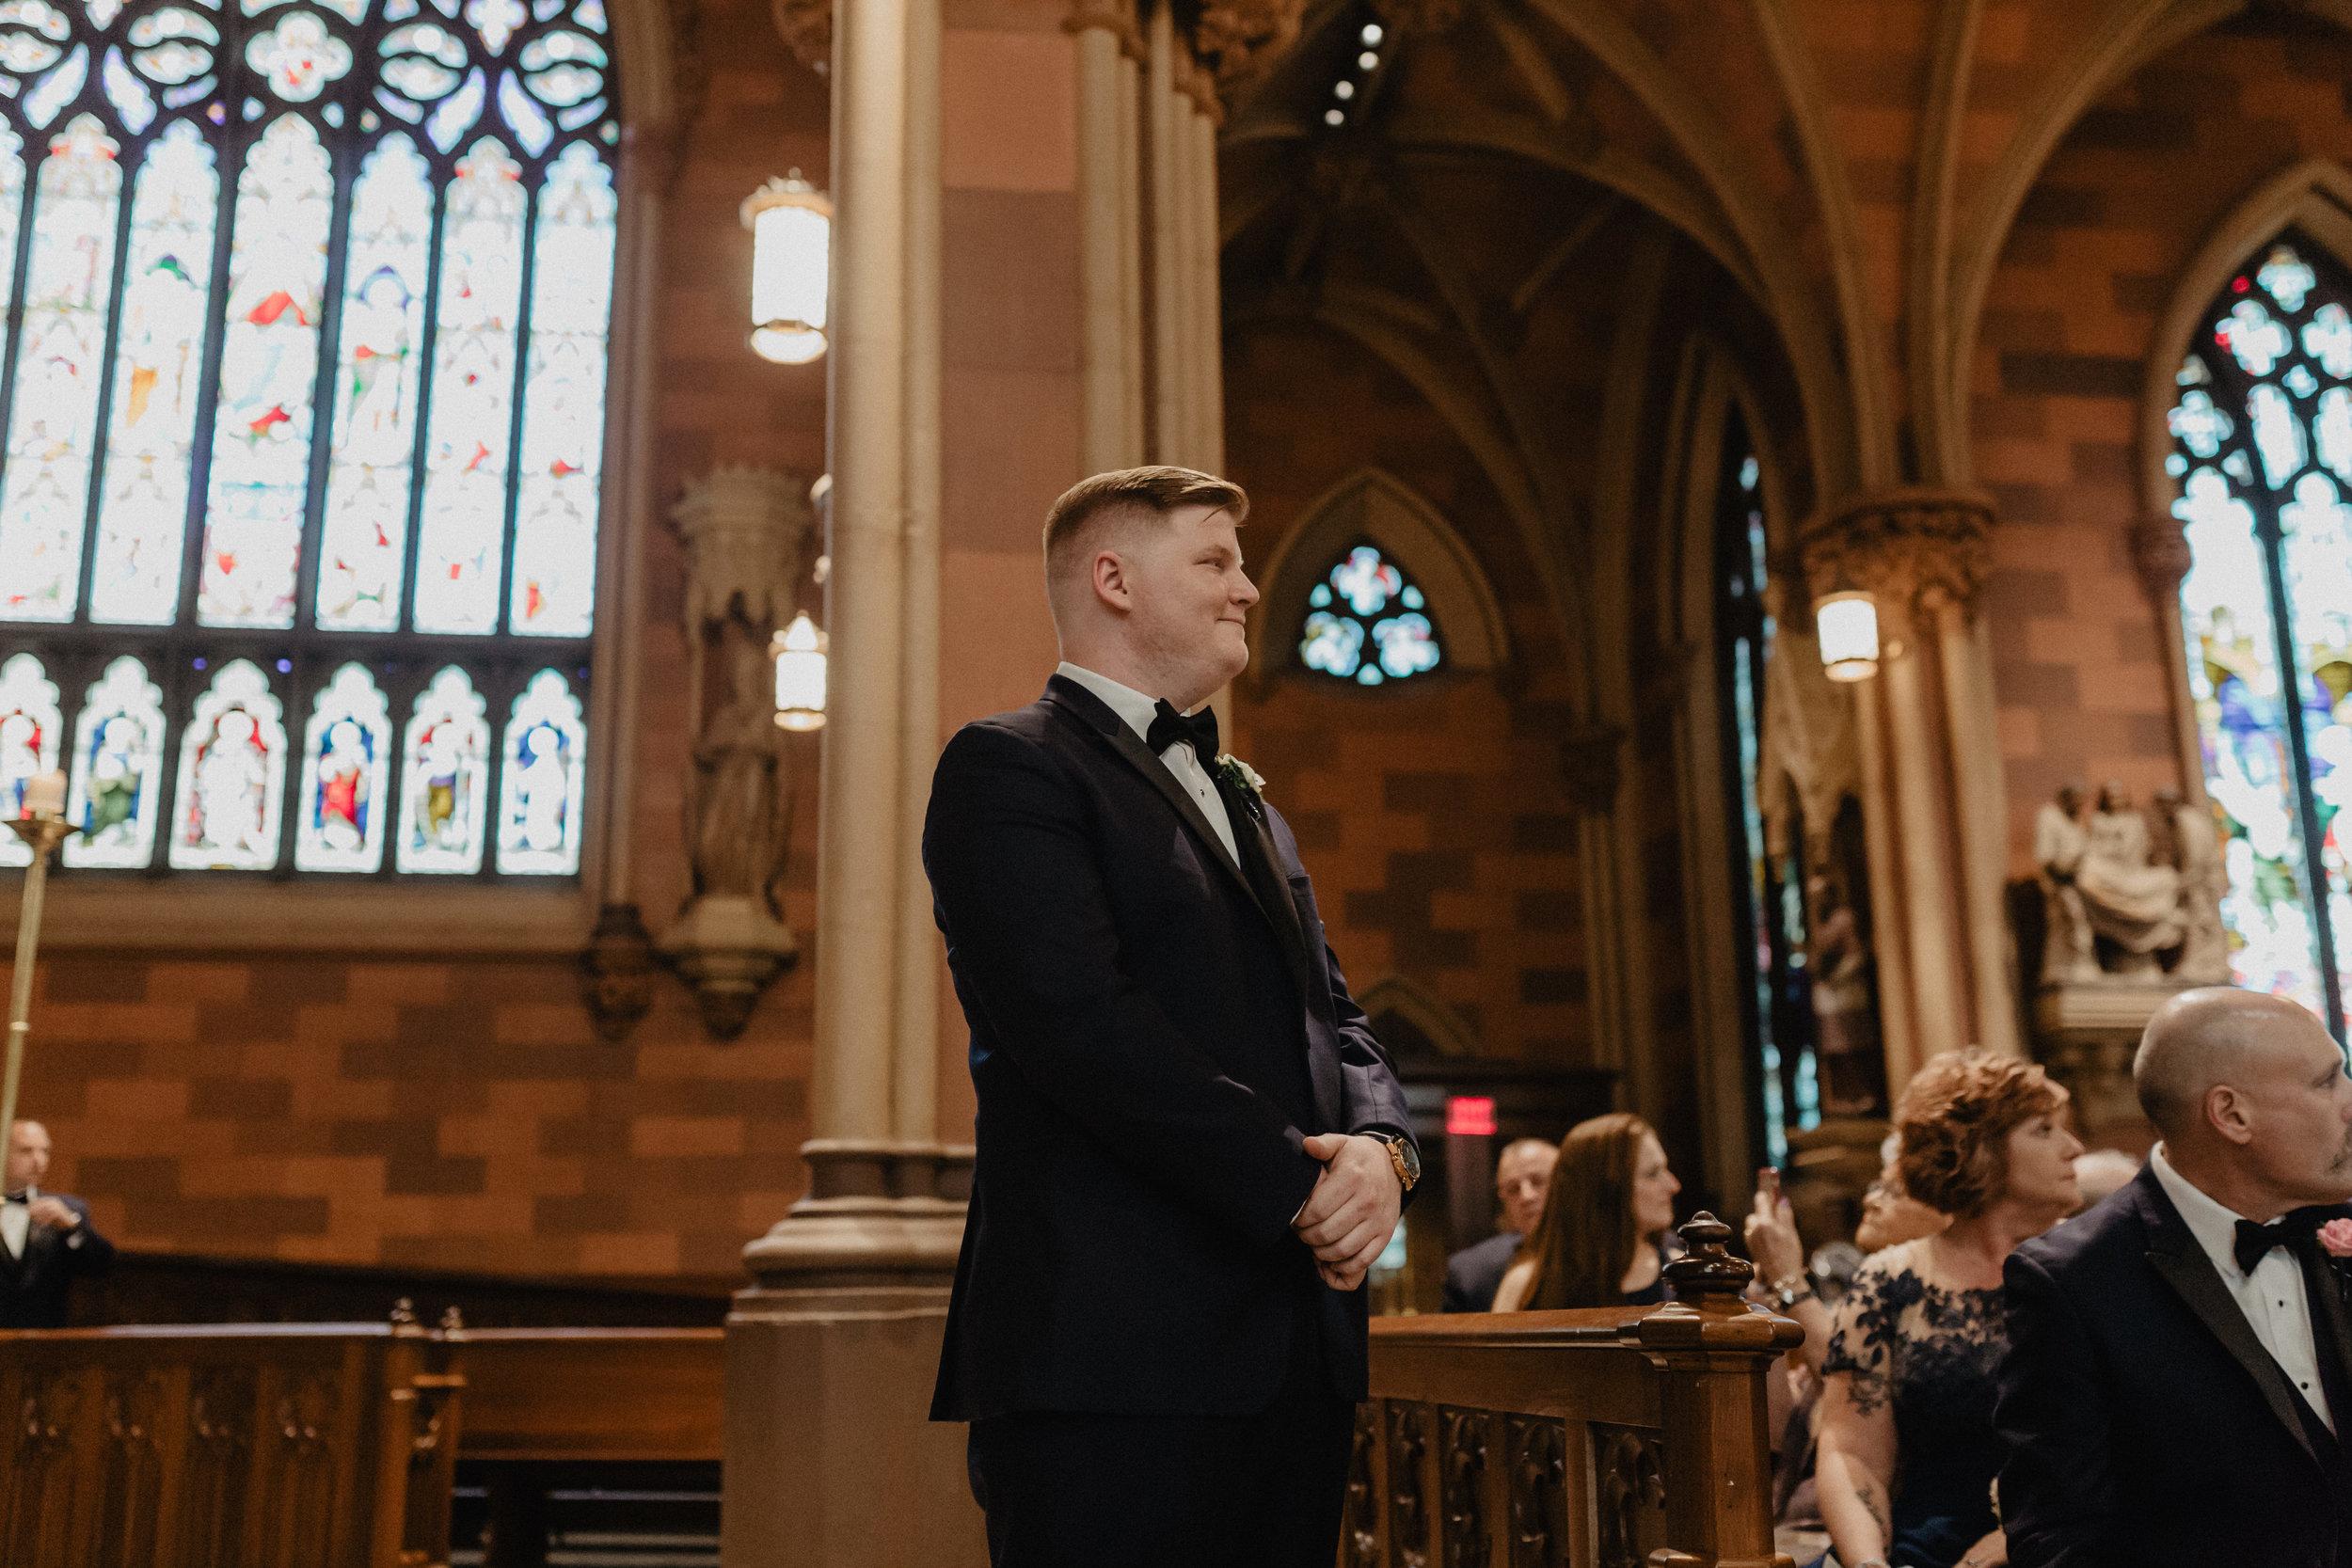 albany-new-york-wedding-19.jpg